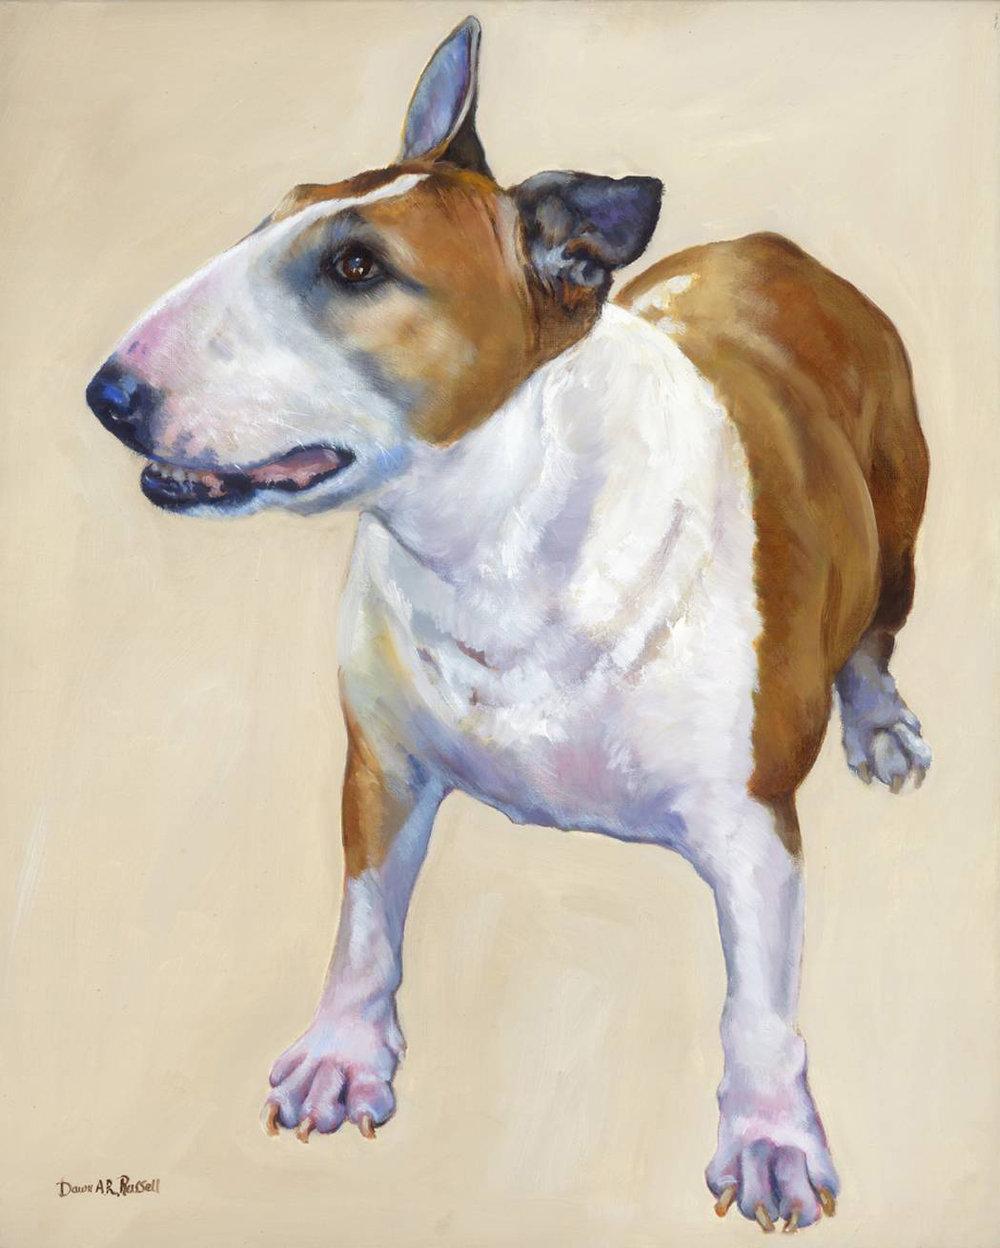 dawn-russell-pet-portraits-at-yardley-arts-2.jpg